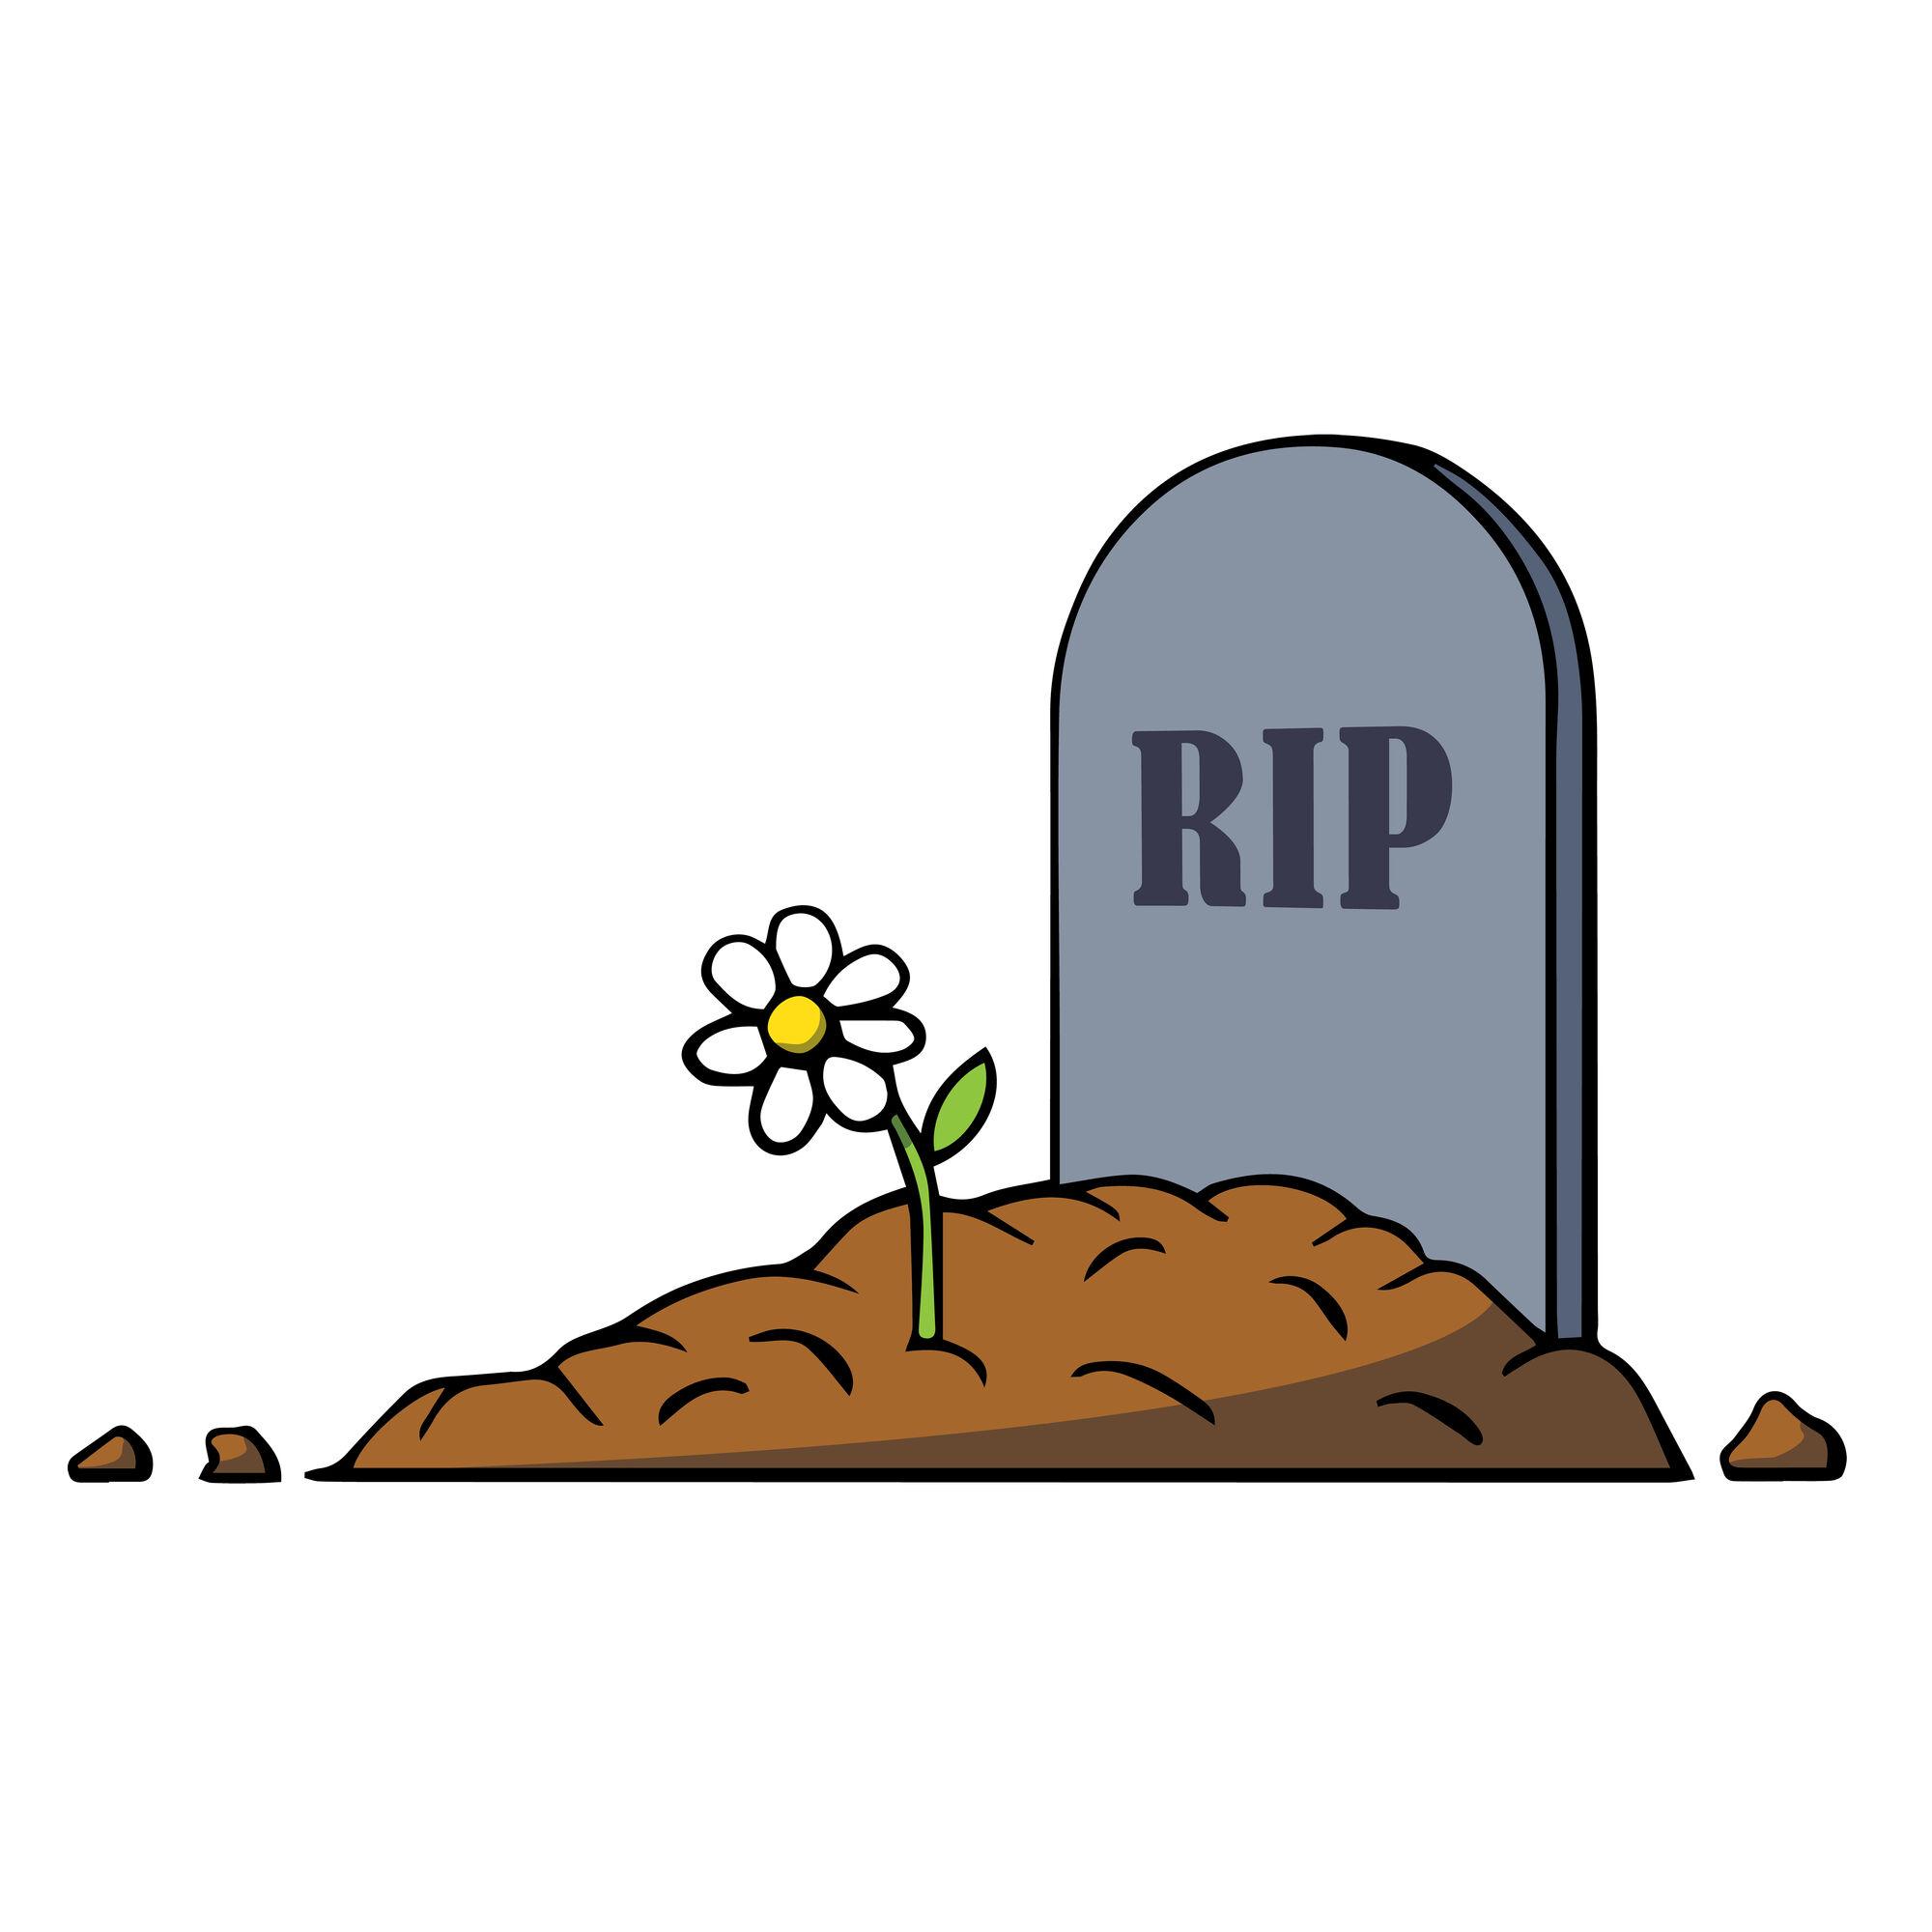 image 02508a3fb753f0dfd65c4e0acb2c8a70 gravestone cartoon 1 rip rh justdance wikia com rip tombstone clipart tombstone clip art images